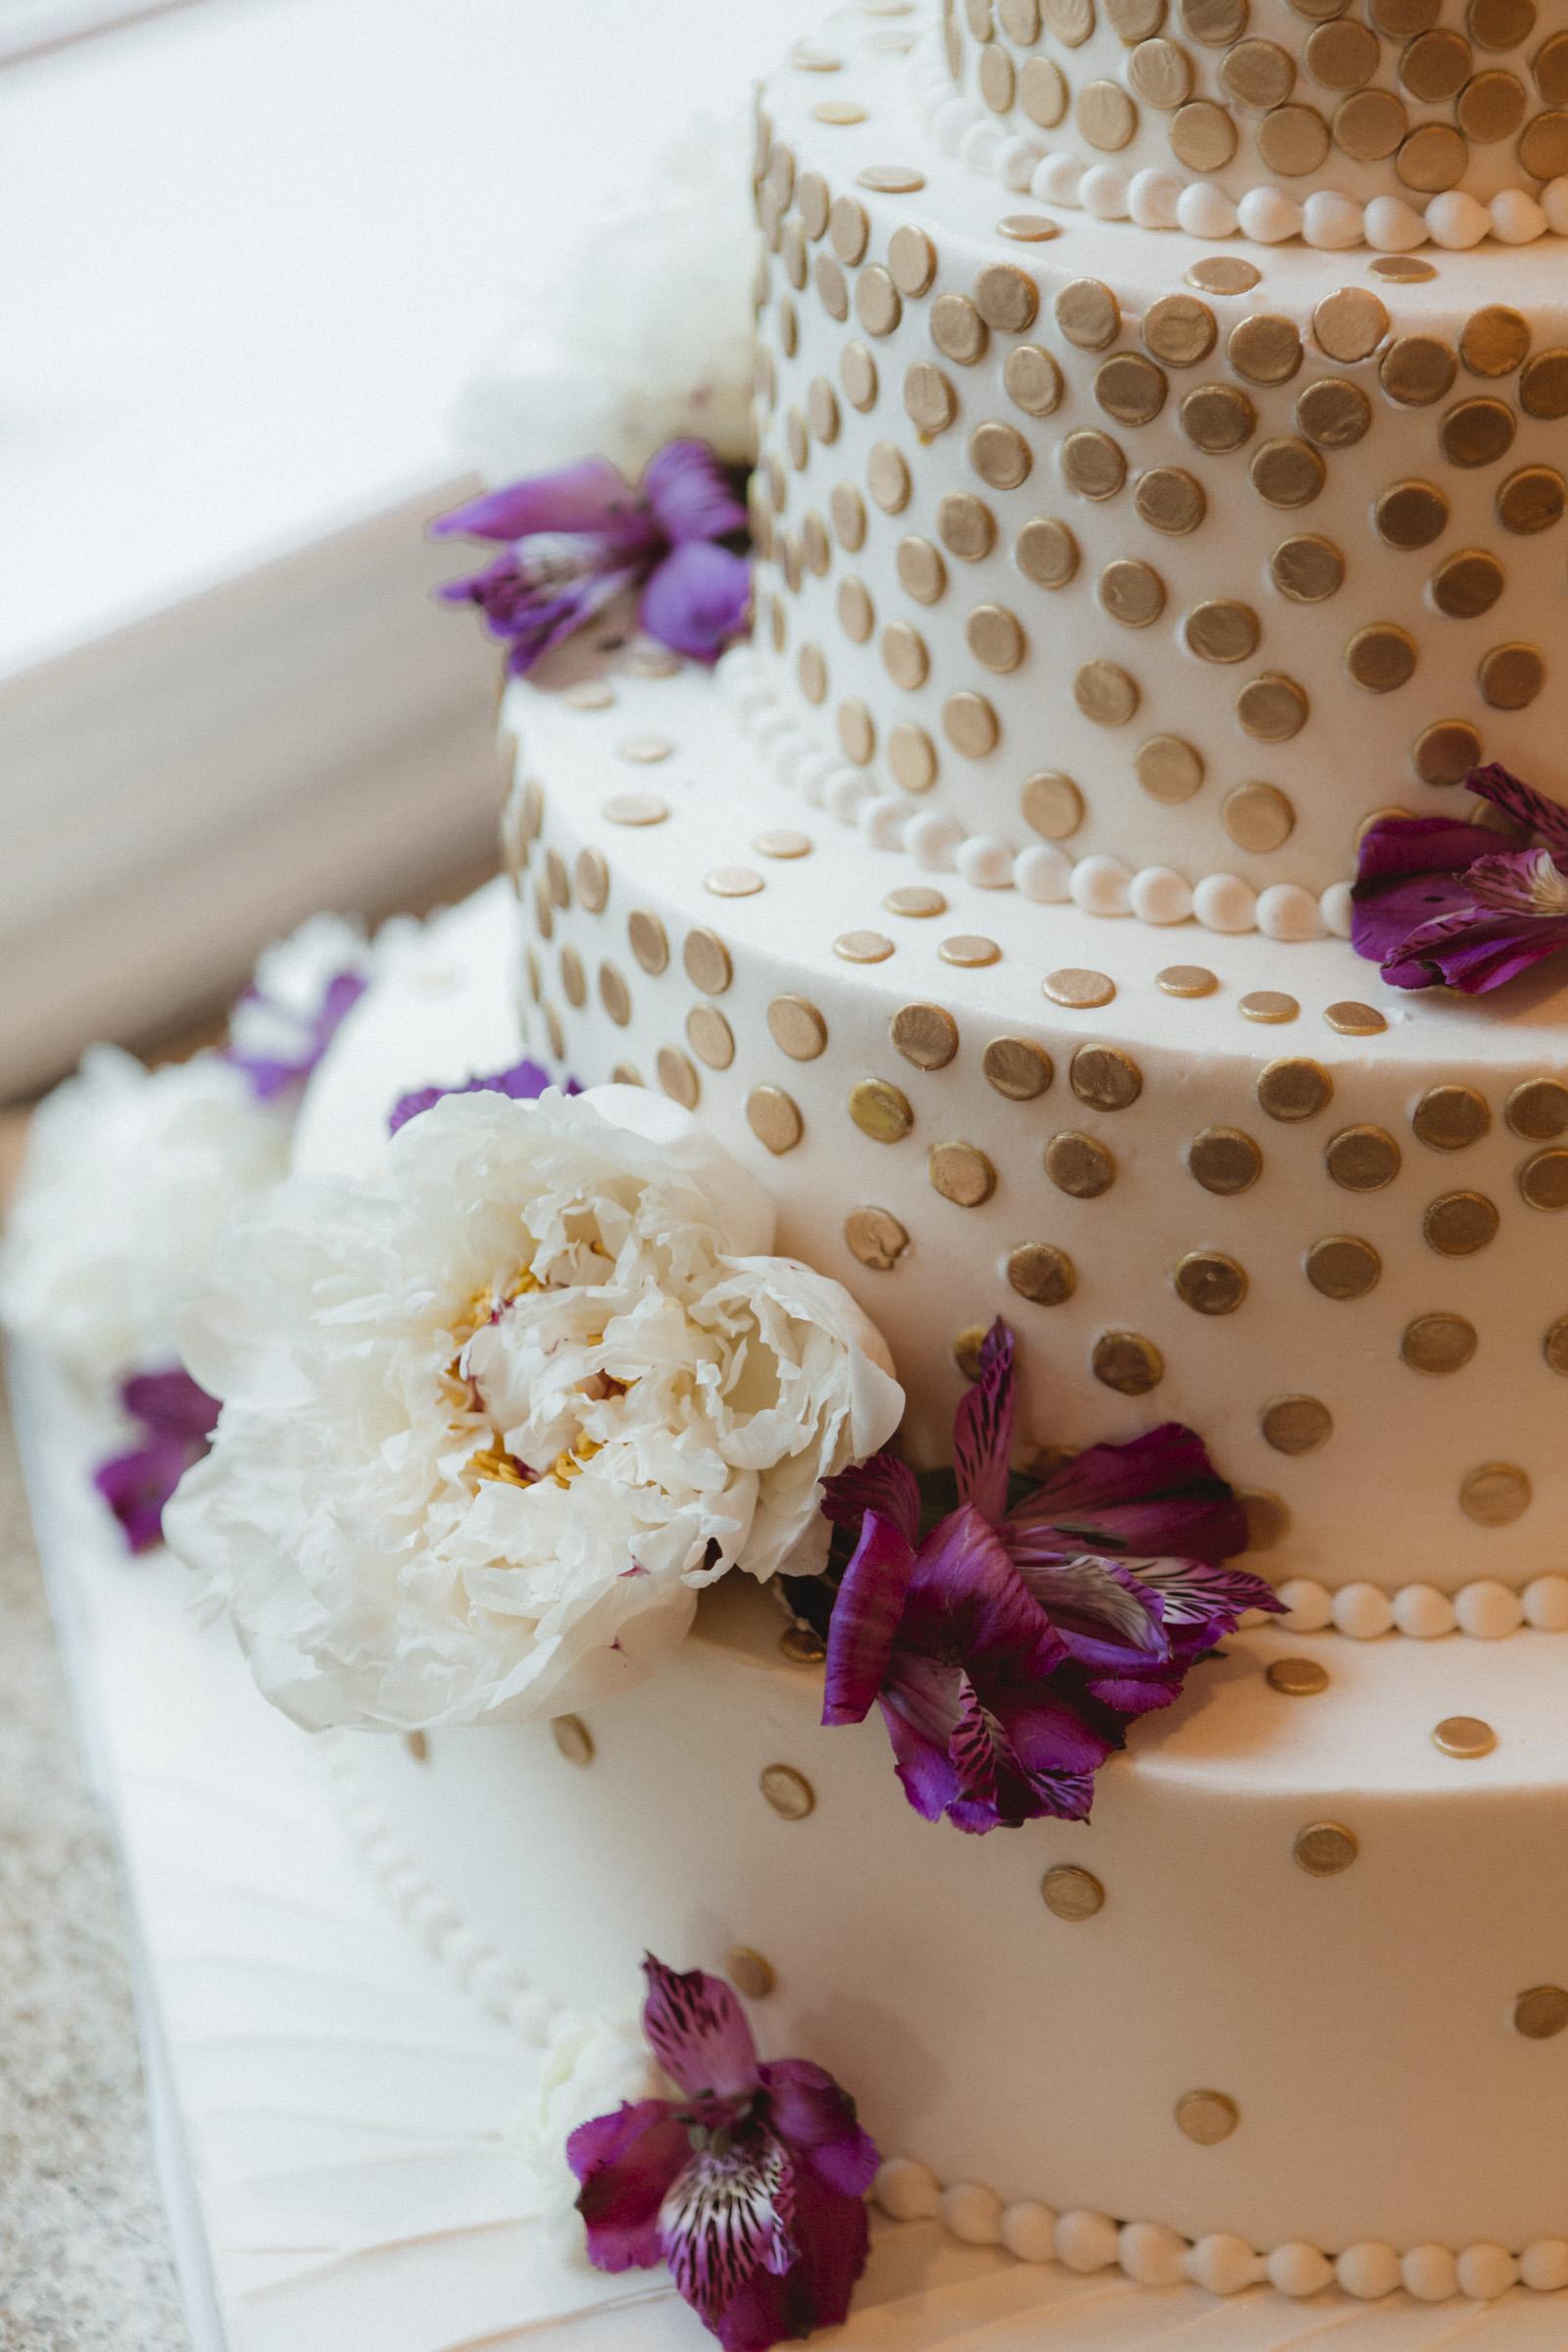 Gold polkadot cake from Palermo's - Estate at Florentine Gardens wedding - Hudson Valley Wedding - Kelsey & Anish's wedding - Amy Sims Photography